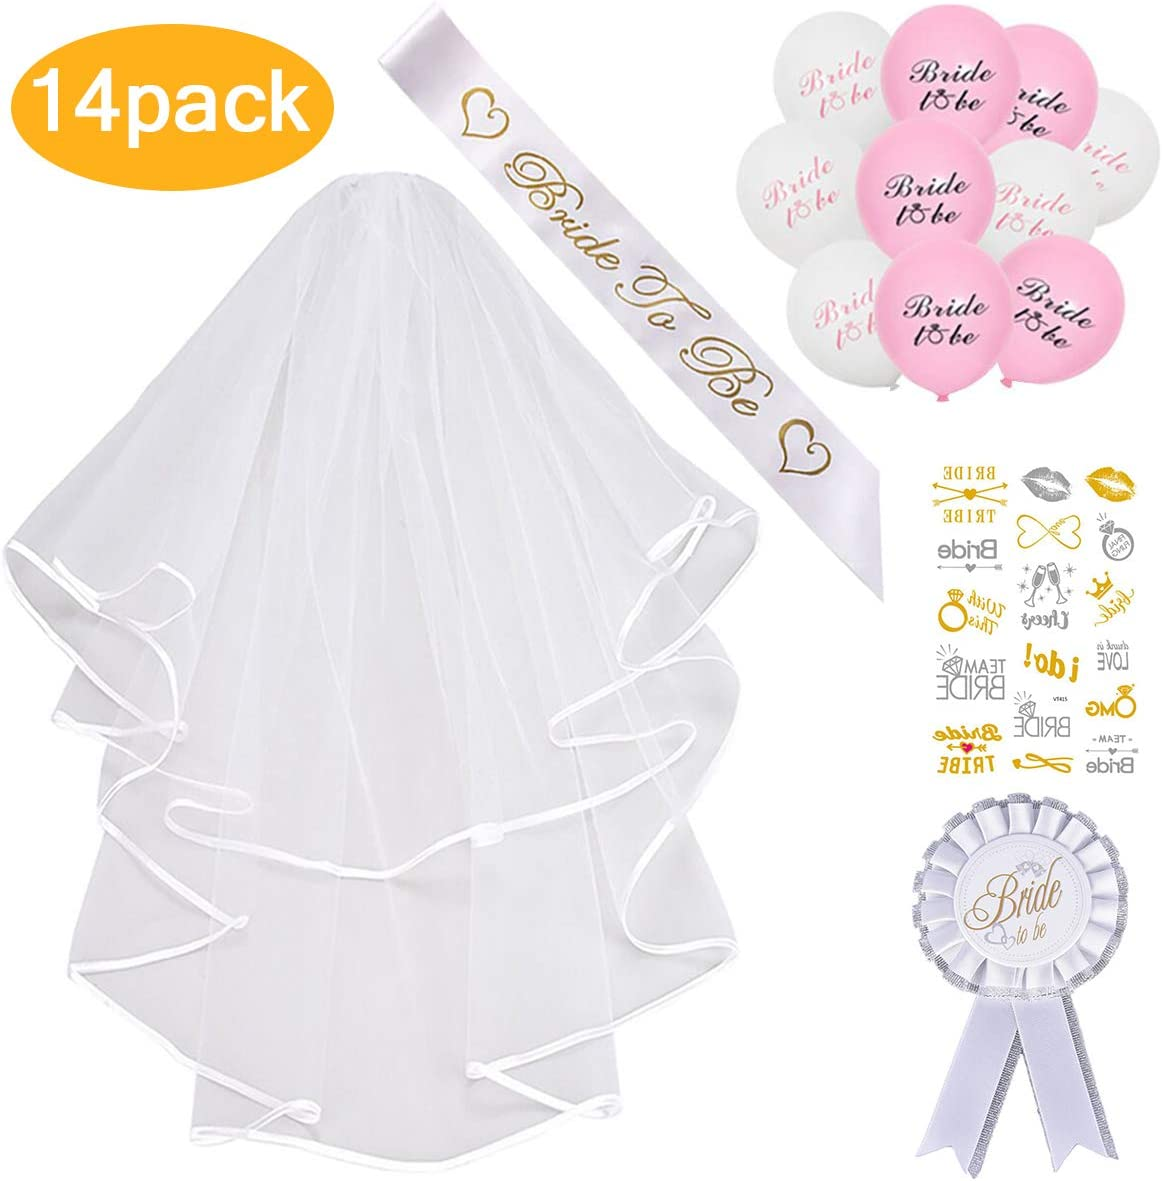 Nanchor Bride to be Decoration Set Bride to Be Sash Balloons Bridal Veil Tattoo Badge for Hen Night Bridal Shower